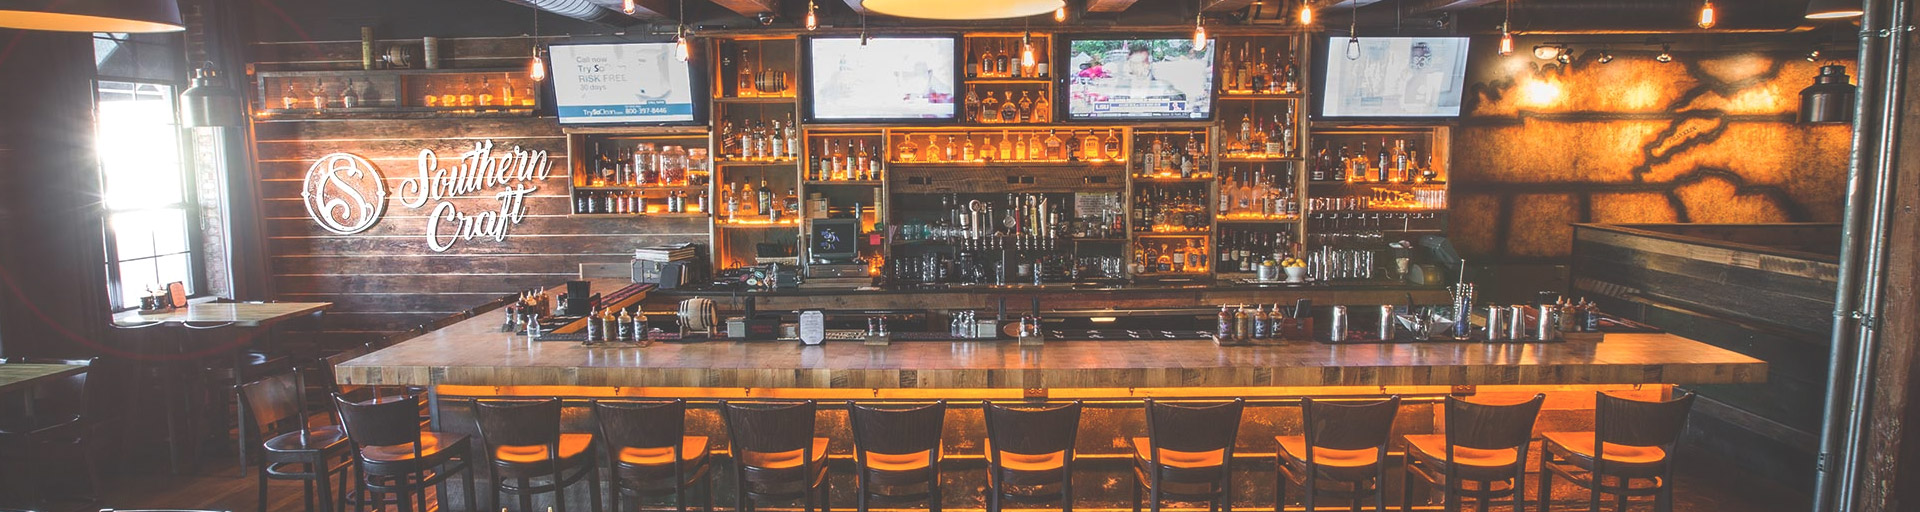 Drink & Dine Bristol Virginia